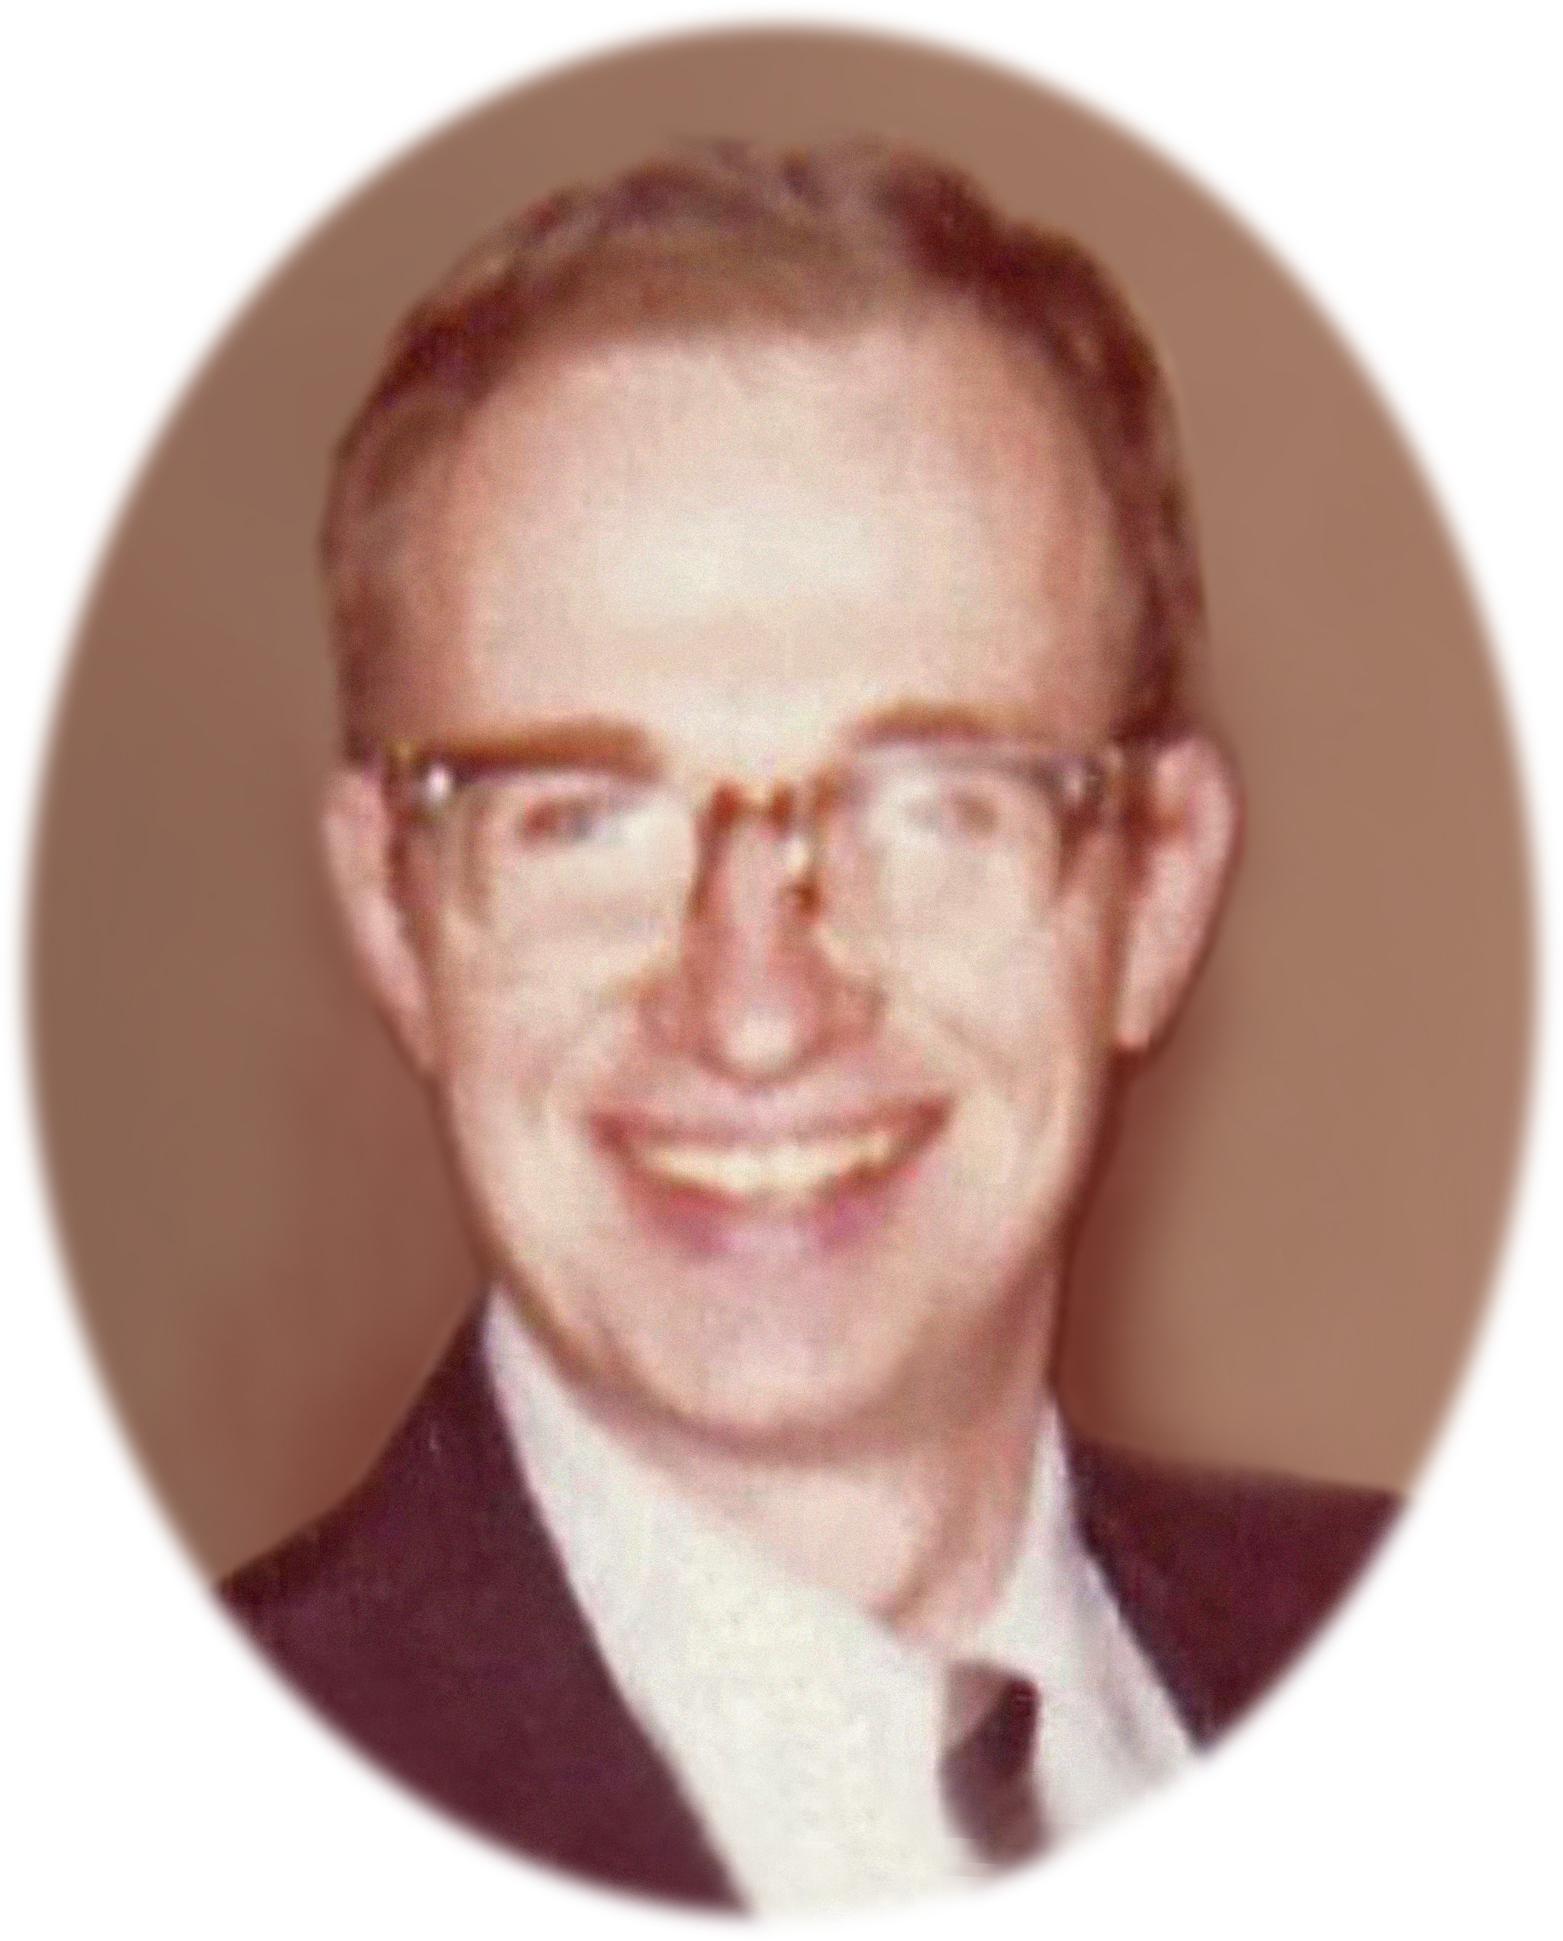 John D. Dowd